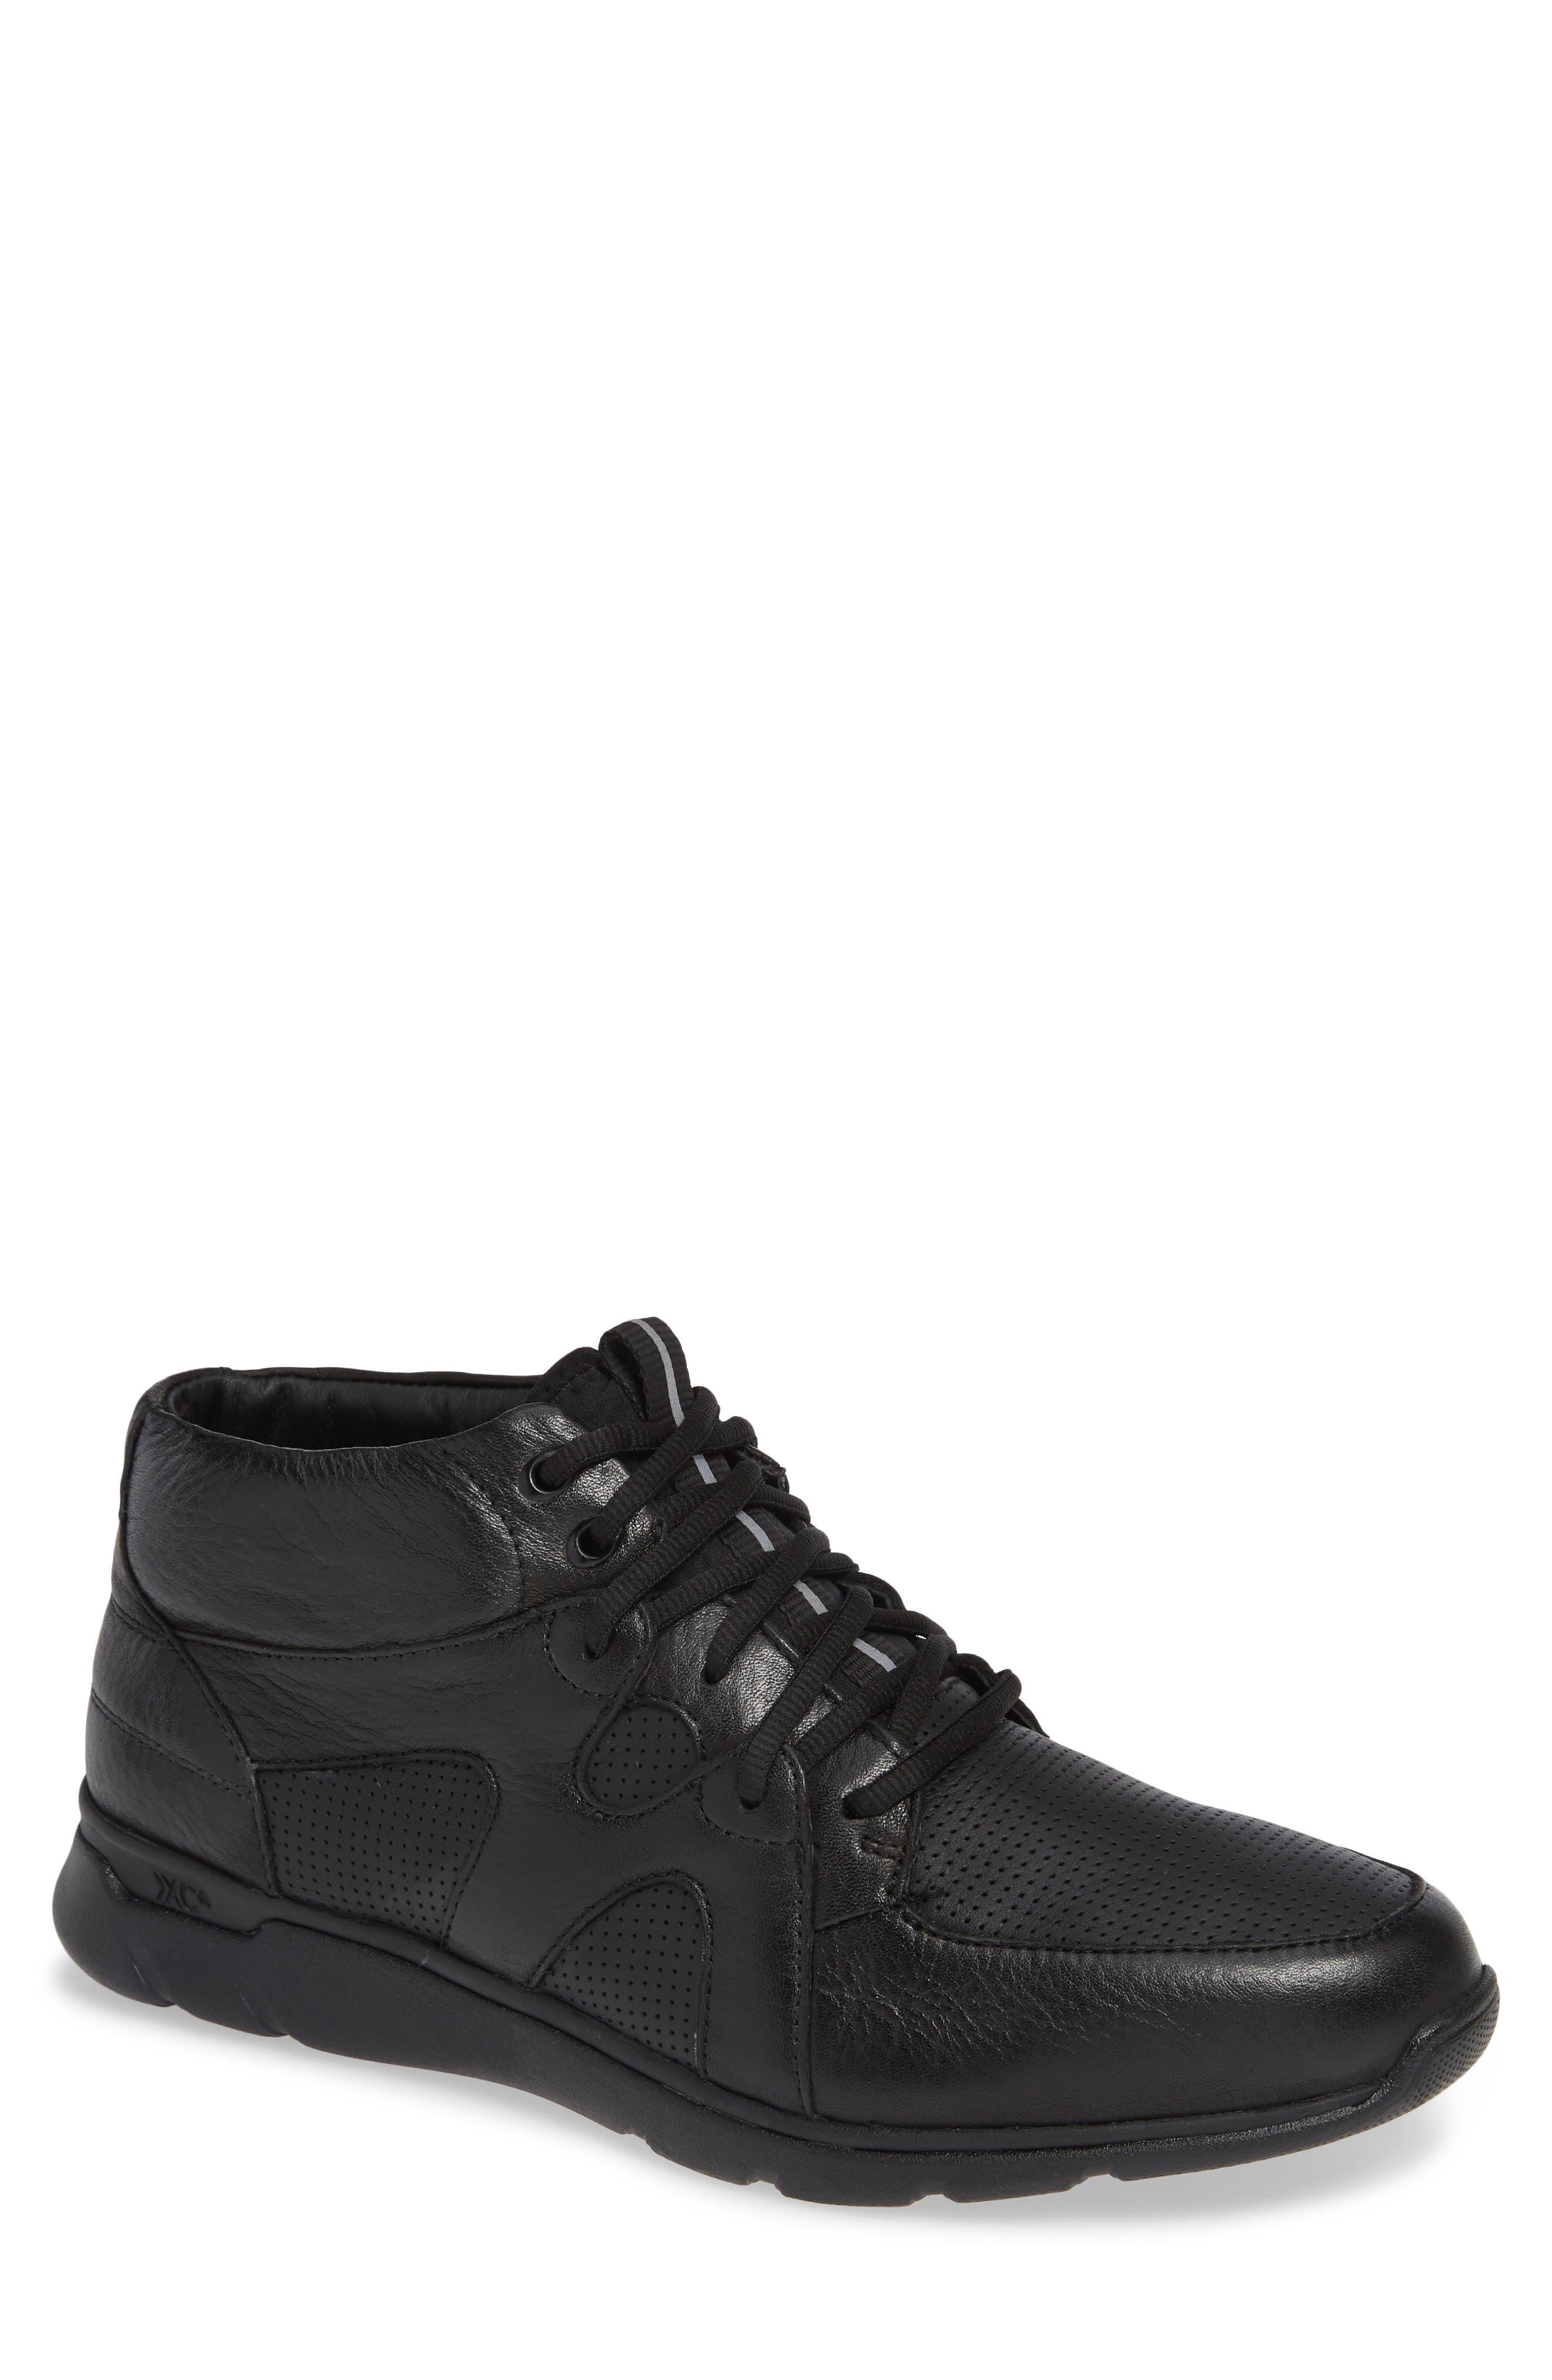 Prentiss Waterproof Sneaker,                             Main thumbnail 1, color,                             BLACK LEATHER